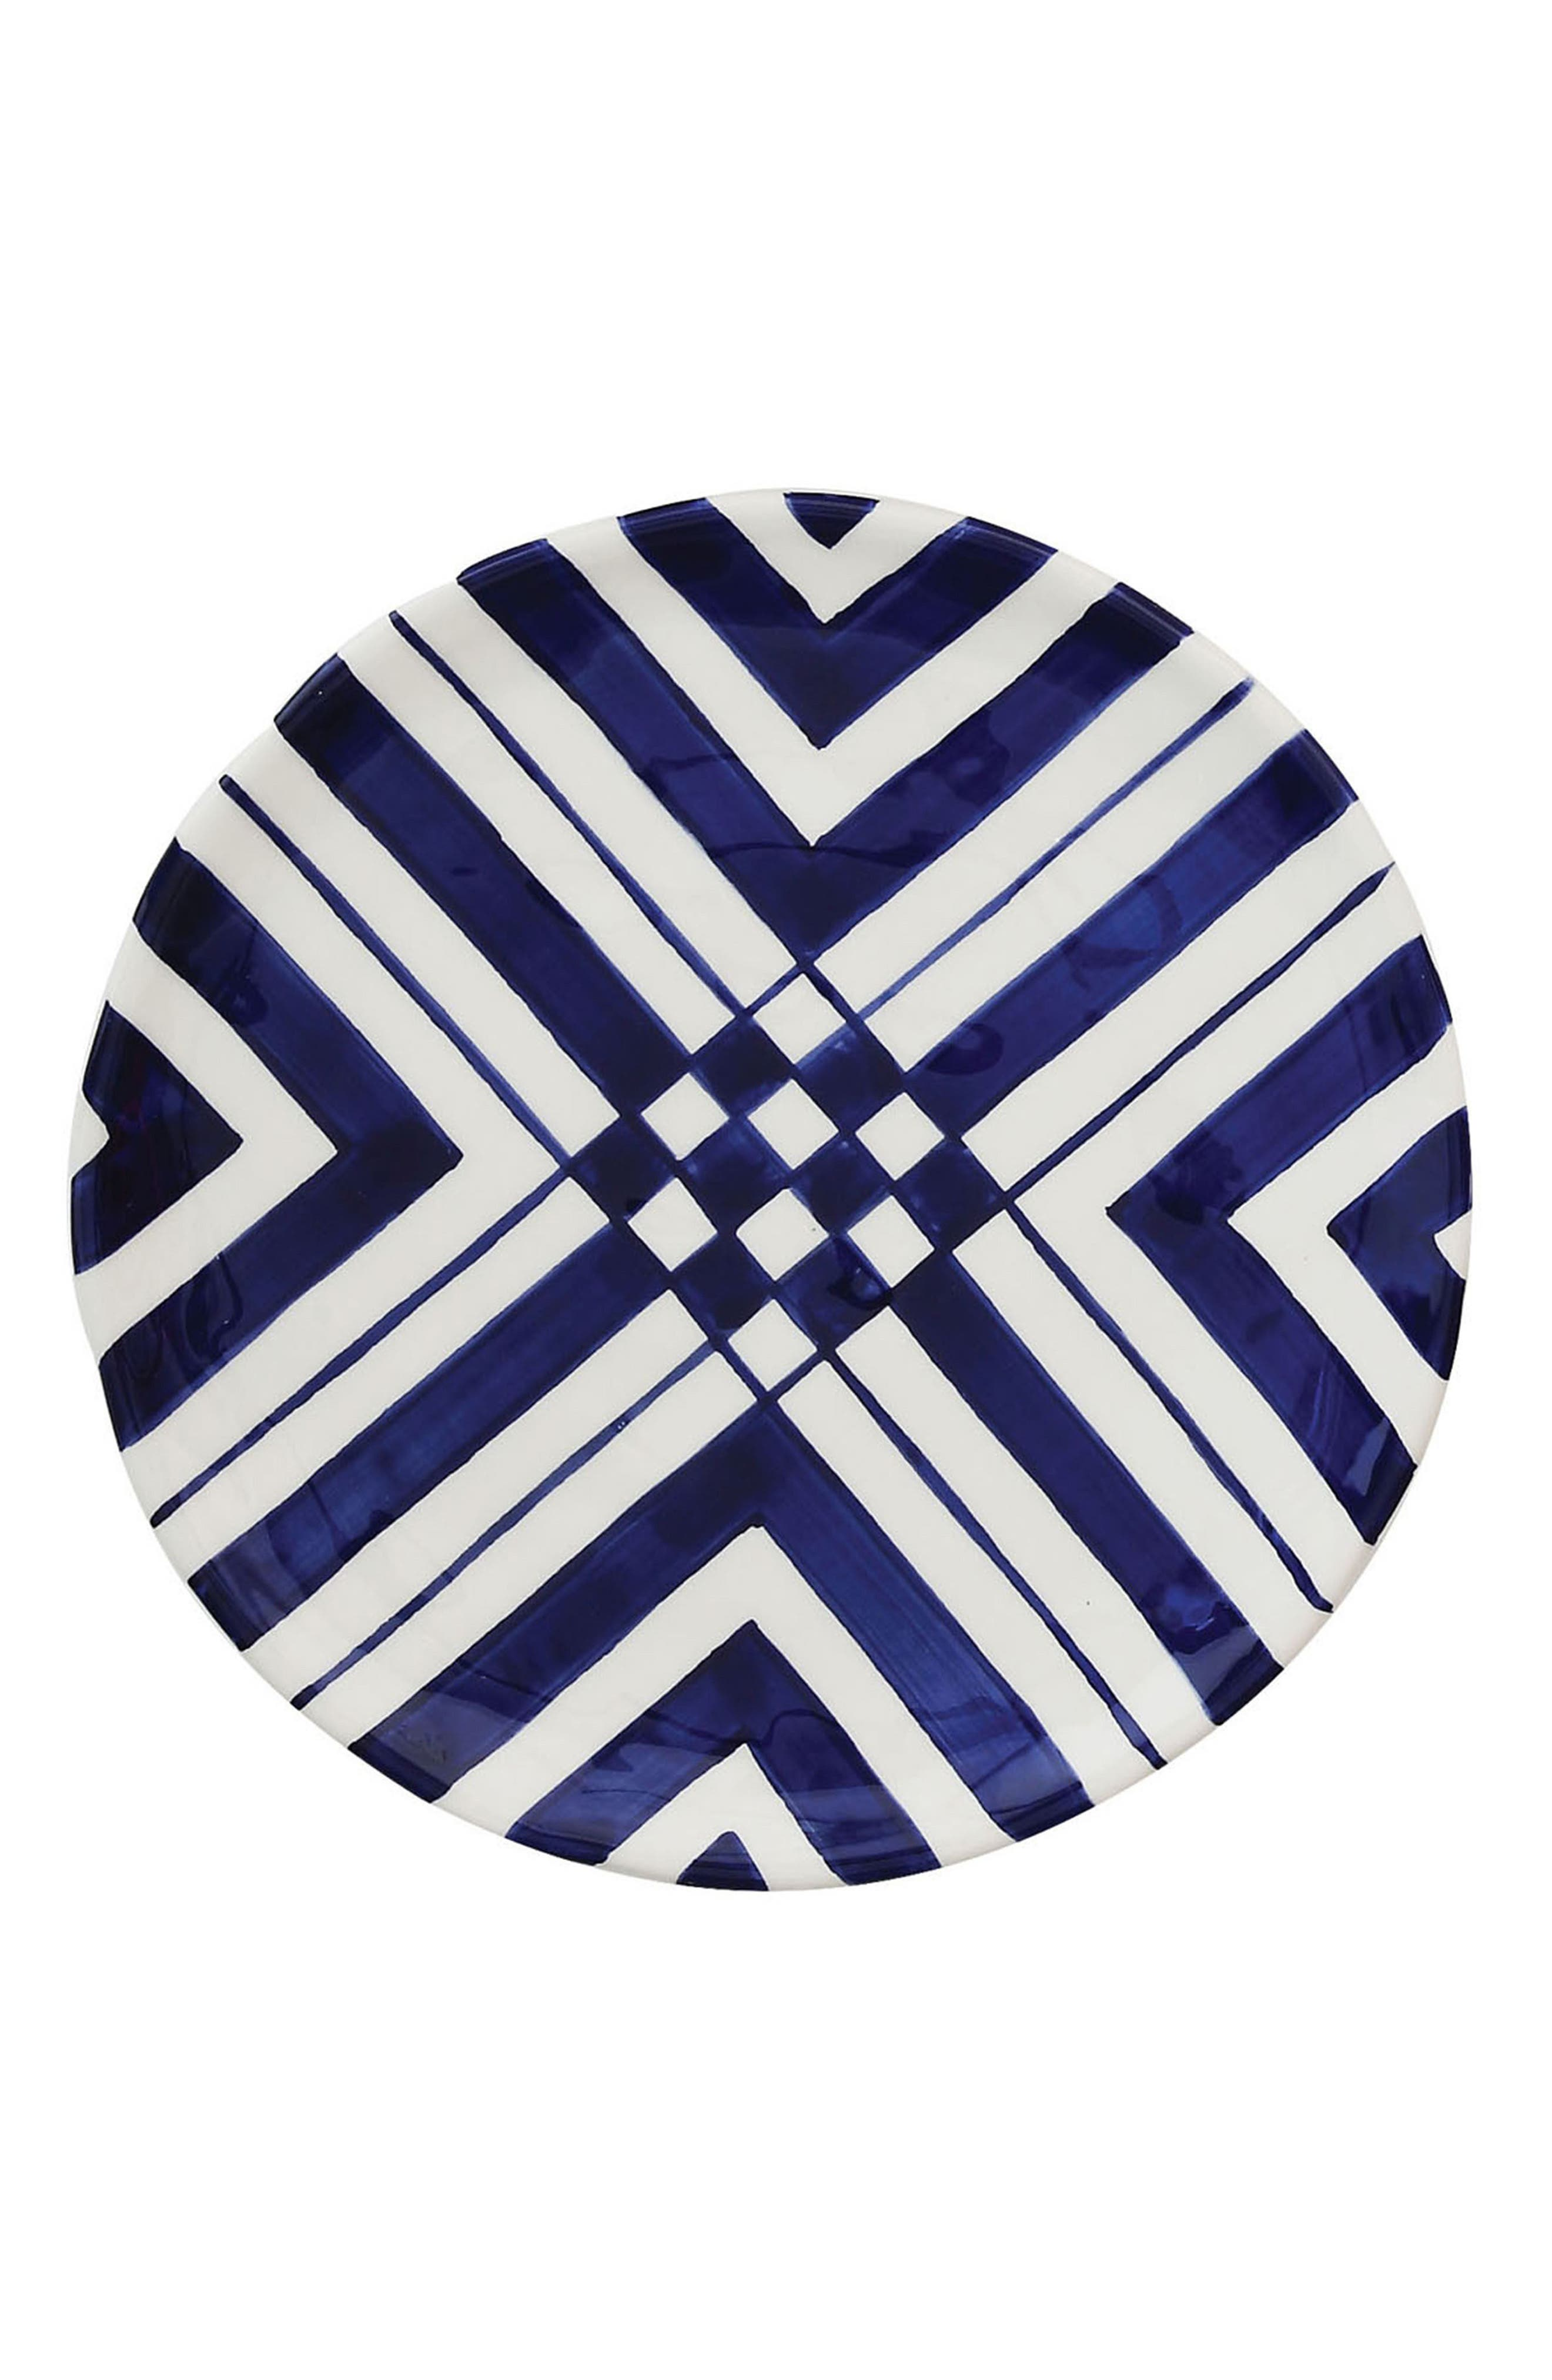 Main Image - Creative Co-Op Blue & White Plate